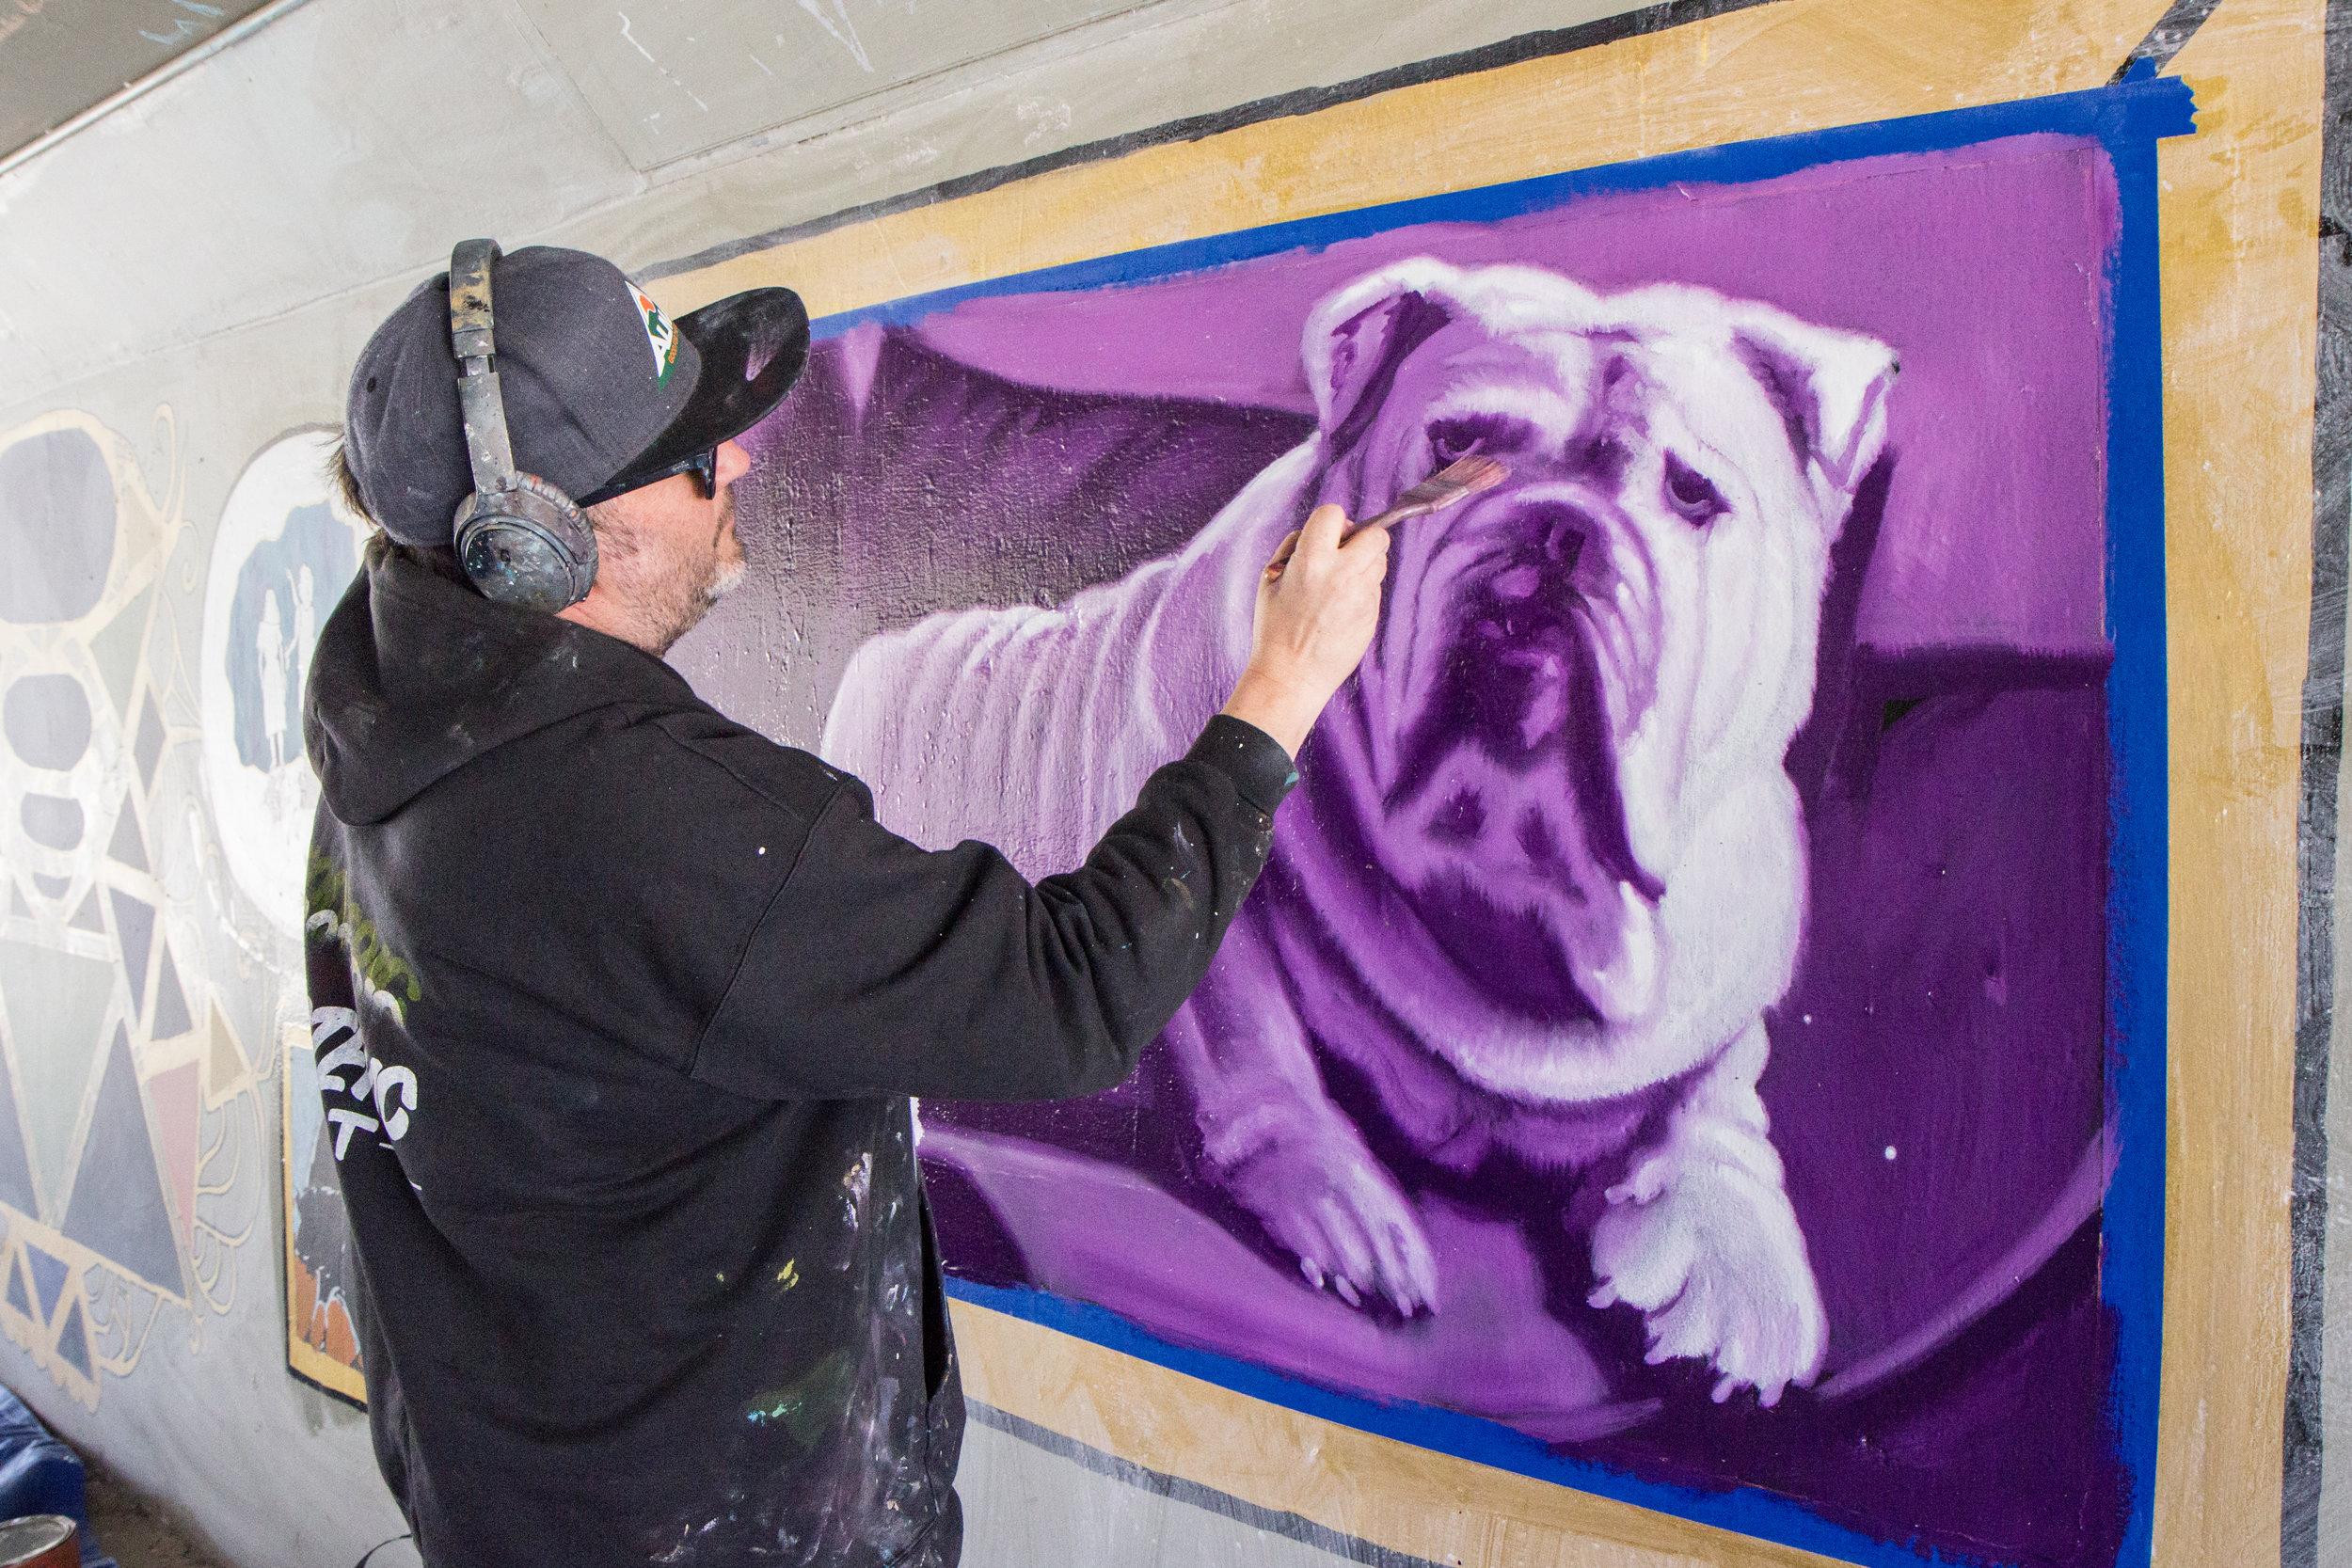 Arts Martin Acres murals 4.11.18-2.jpg